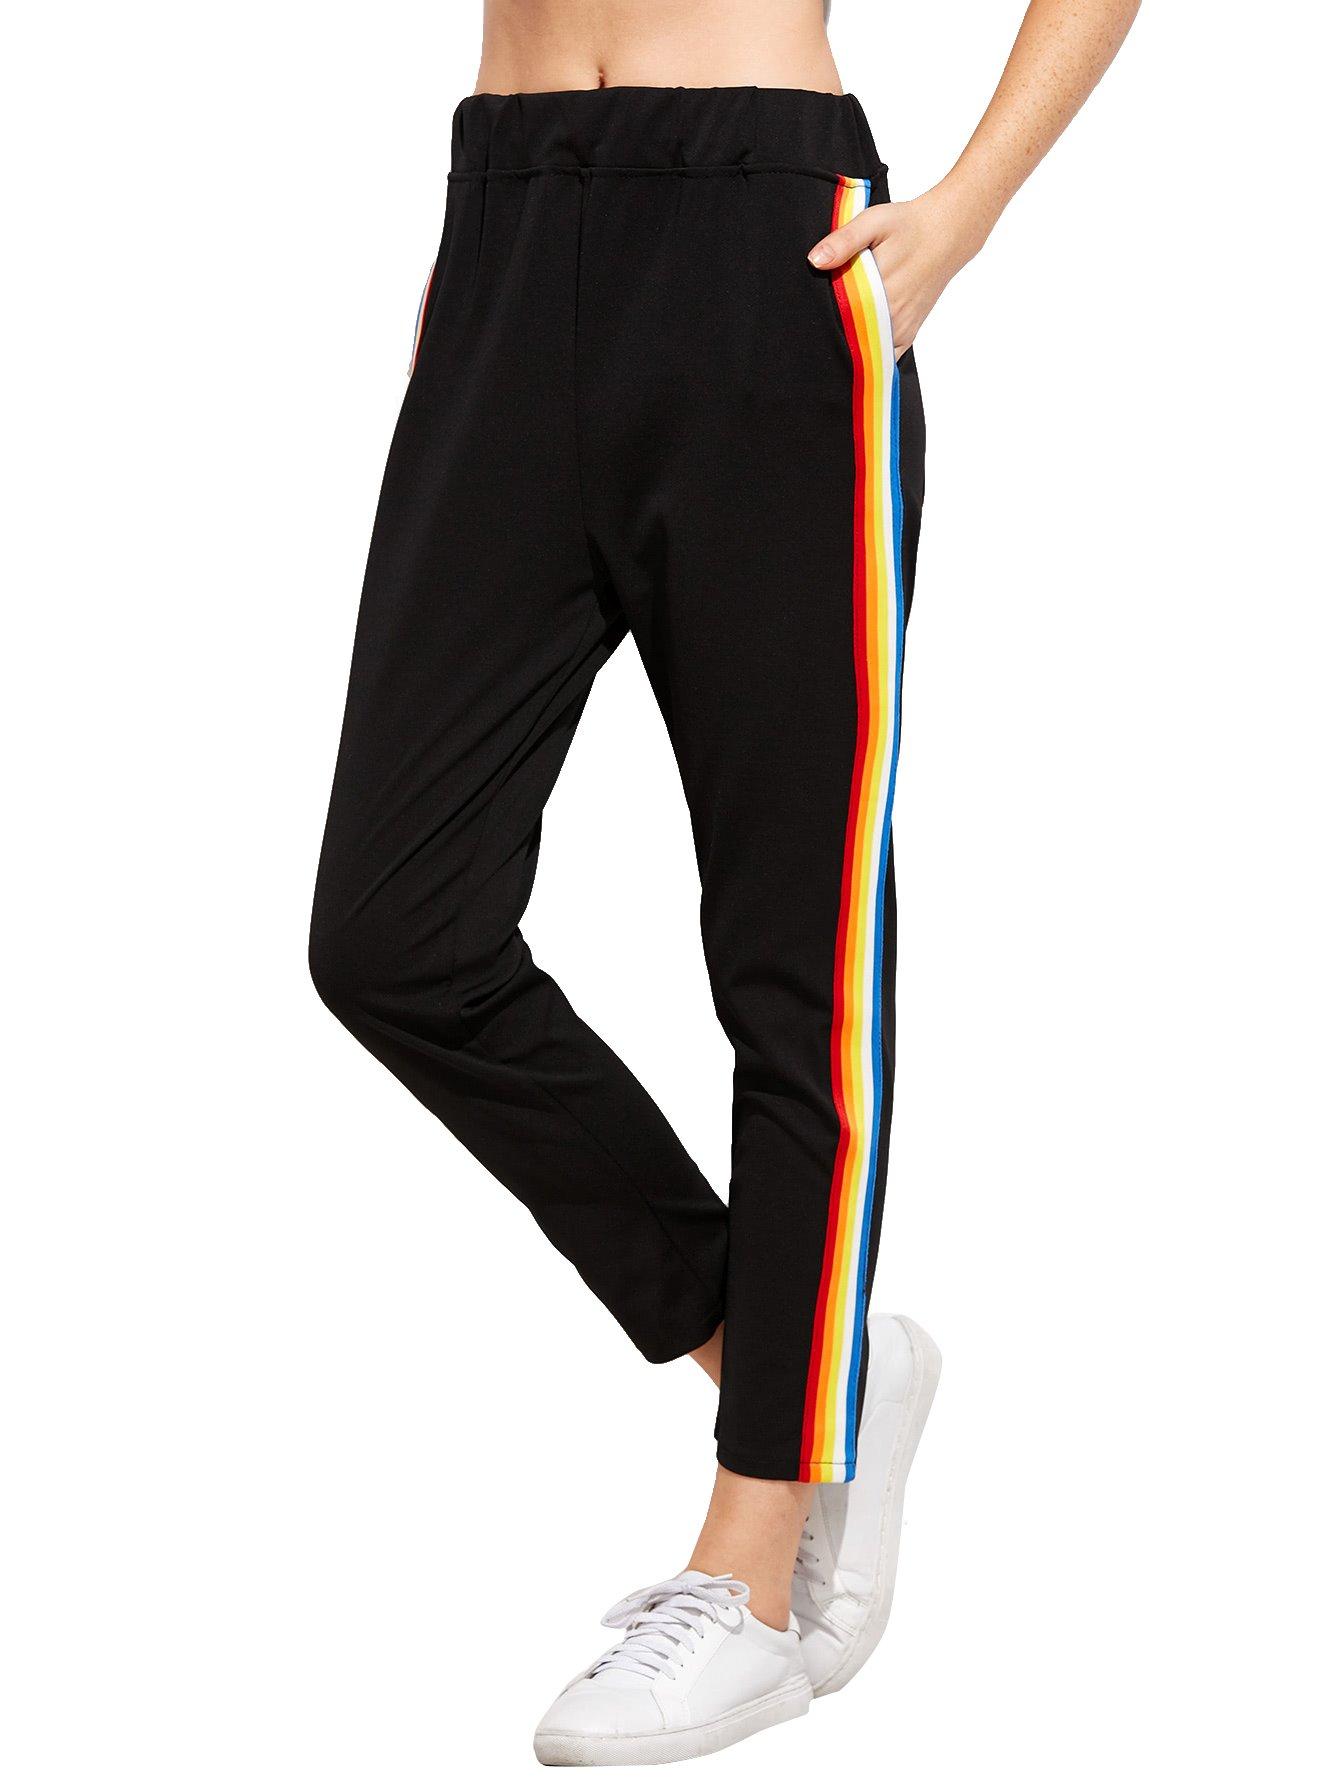 Romwe Women's Casual Athletic Rainbow Stripe Sweatpants Yoga Elastic Mid Waist Jogger Track Pants Black S